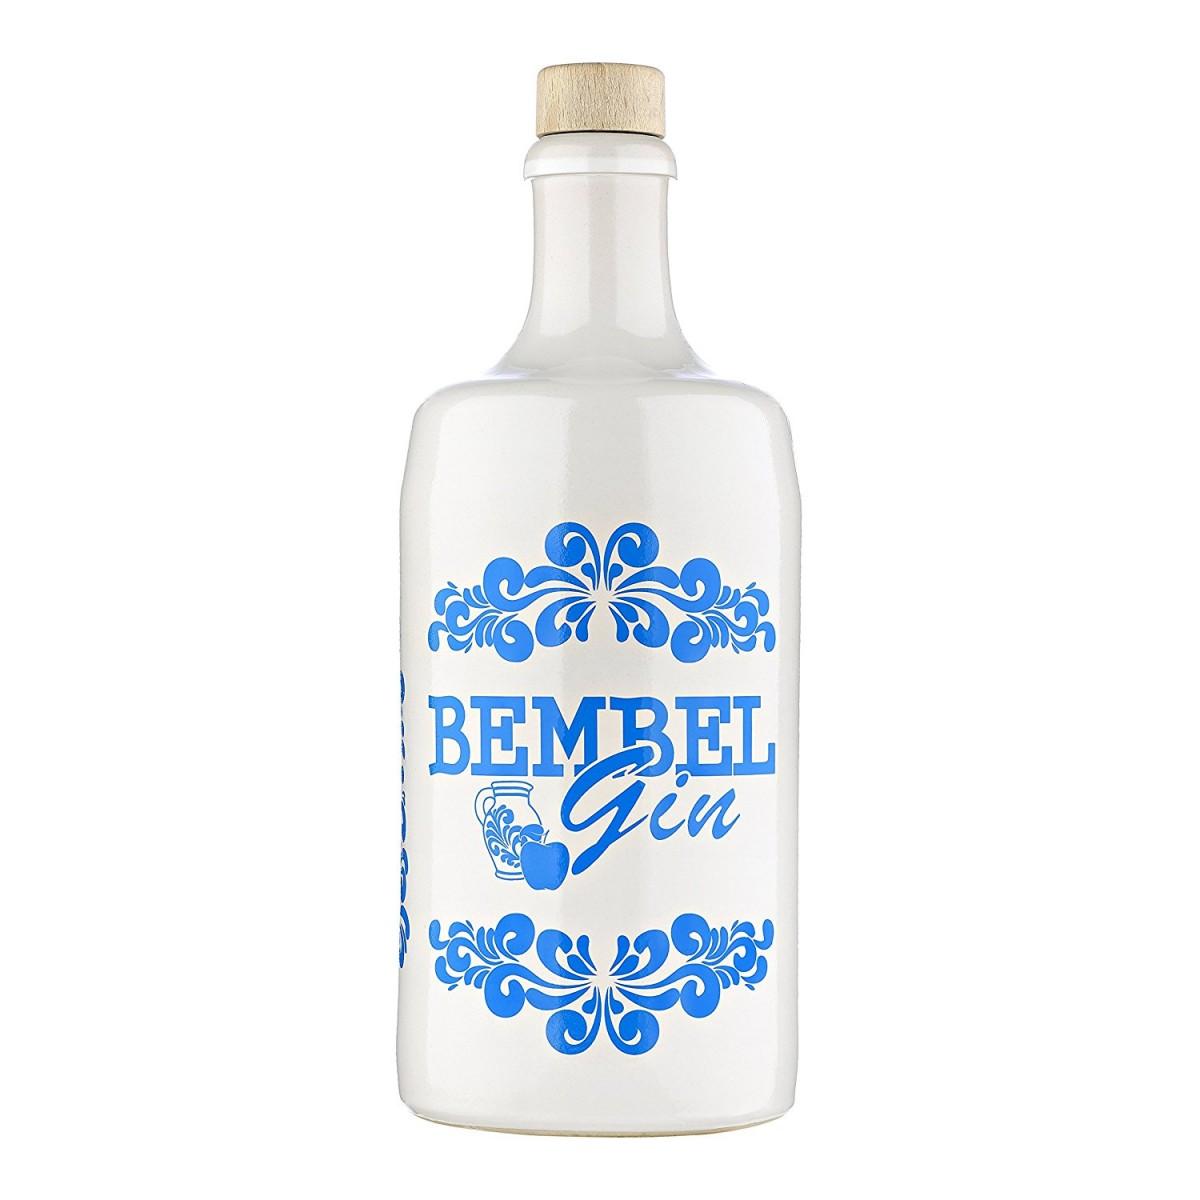 Bembel Gin - Apfel Gin, erfunden im Herzen Europas.